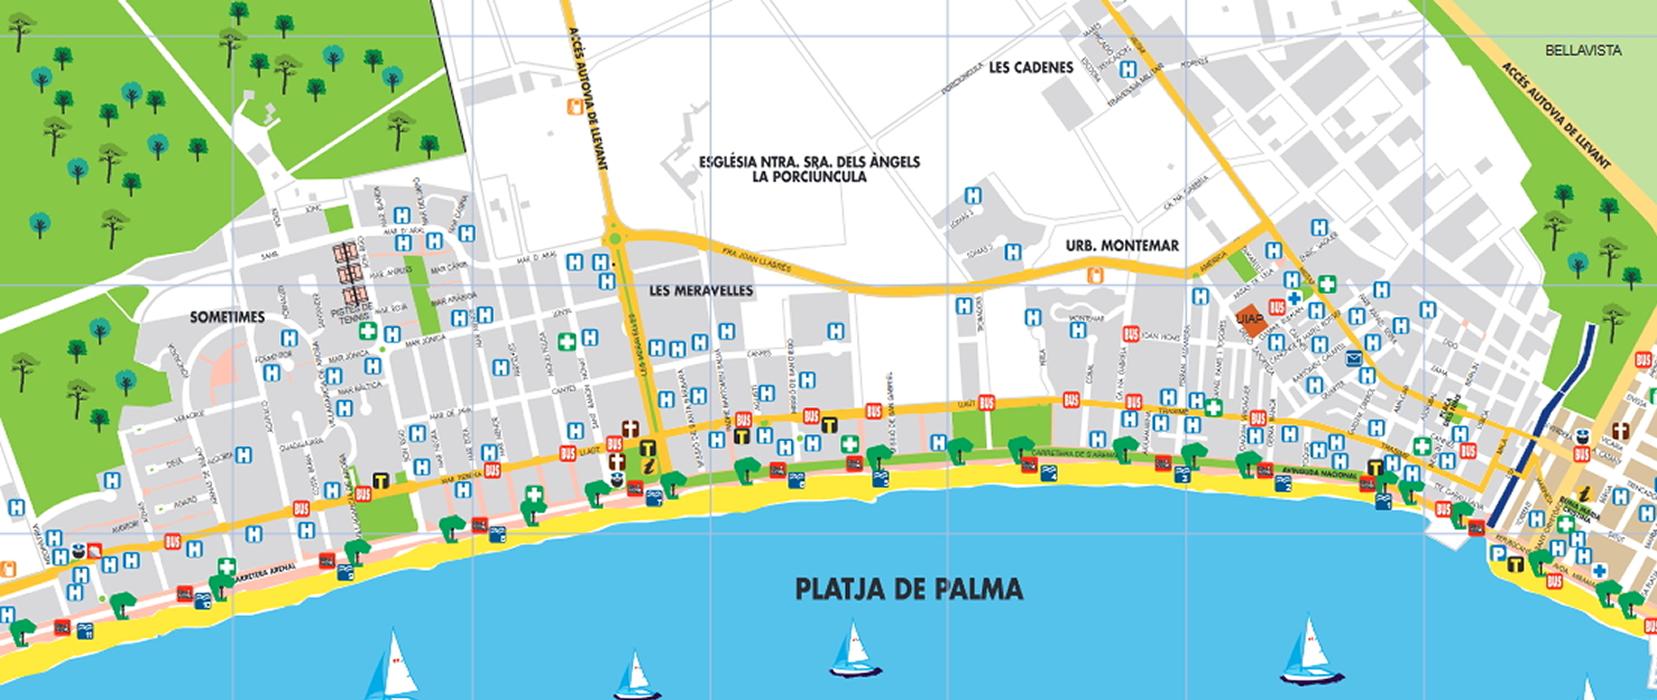 playa de palma karte Beach of S'Arenal of Llucmajor   Visit Llucmajor : Visit Llucmajor playa de palma karte